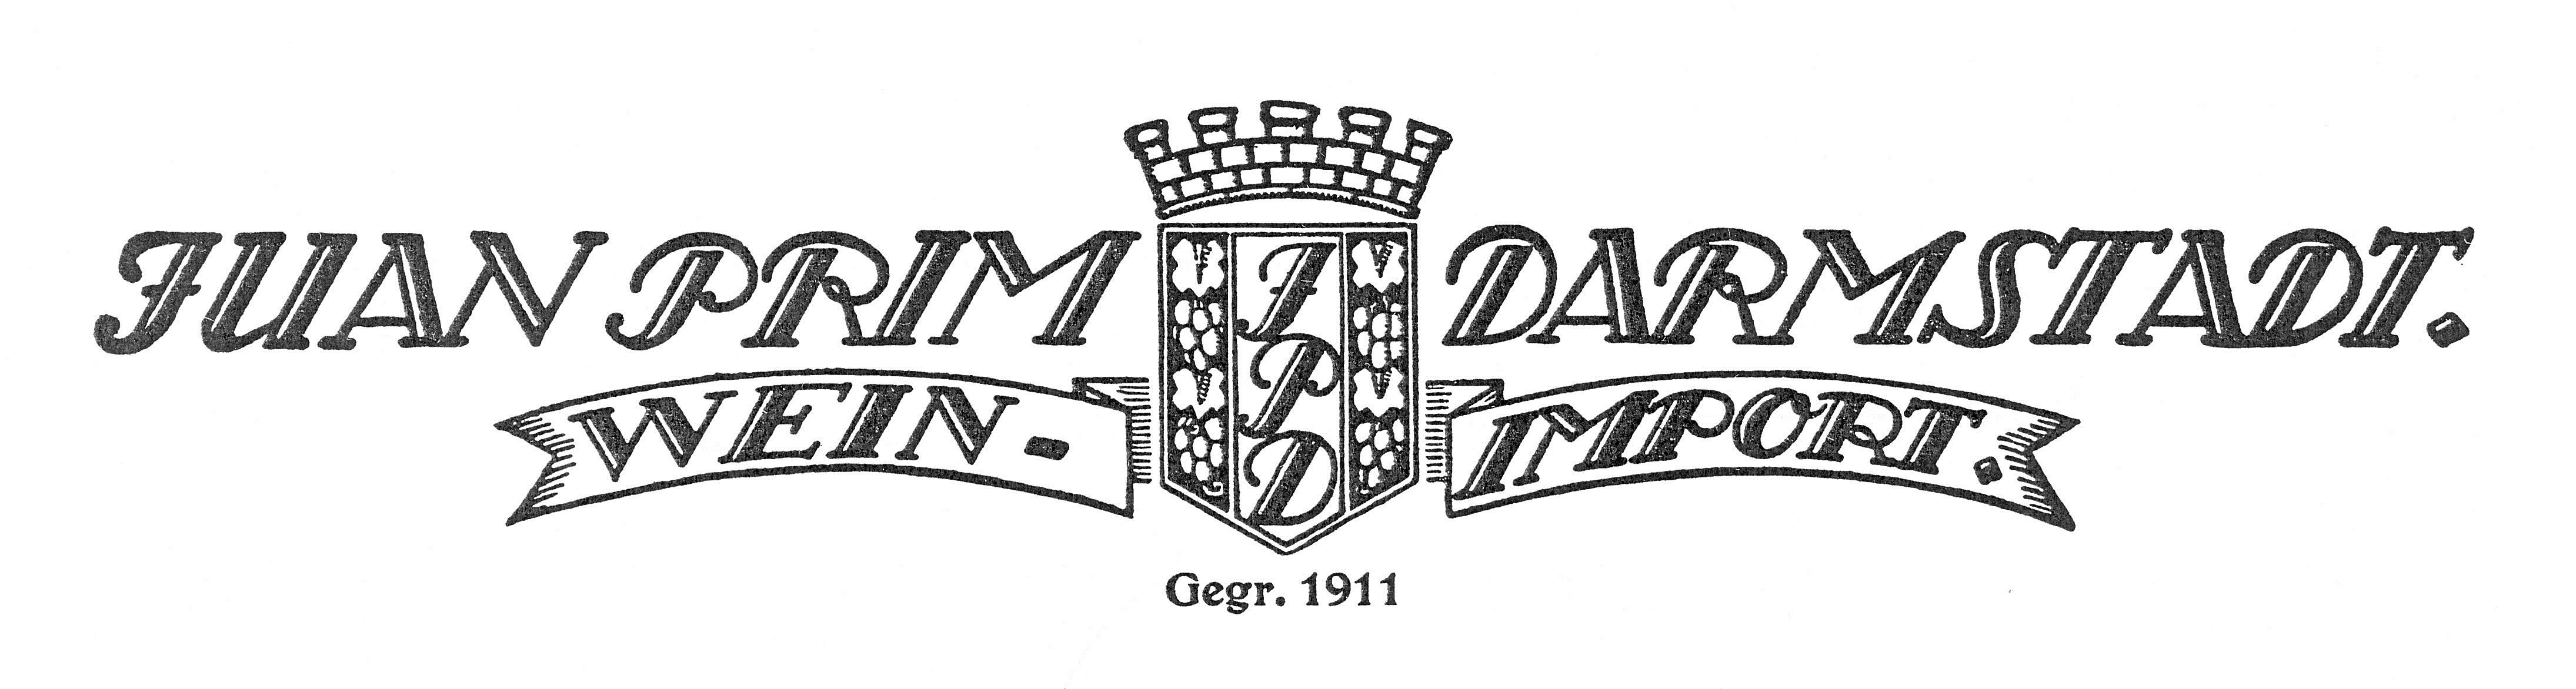 Briefkopf der Firma Juan Prim Darmstadt, StadtA DA Best. 63